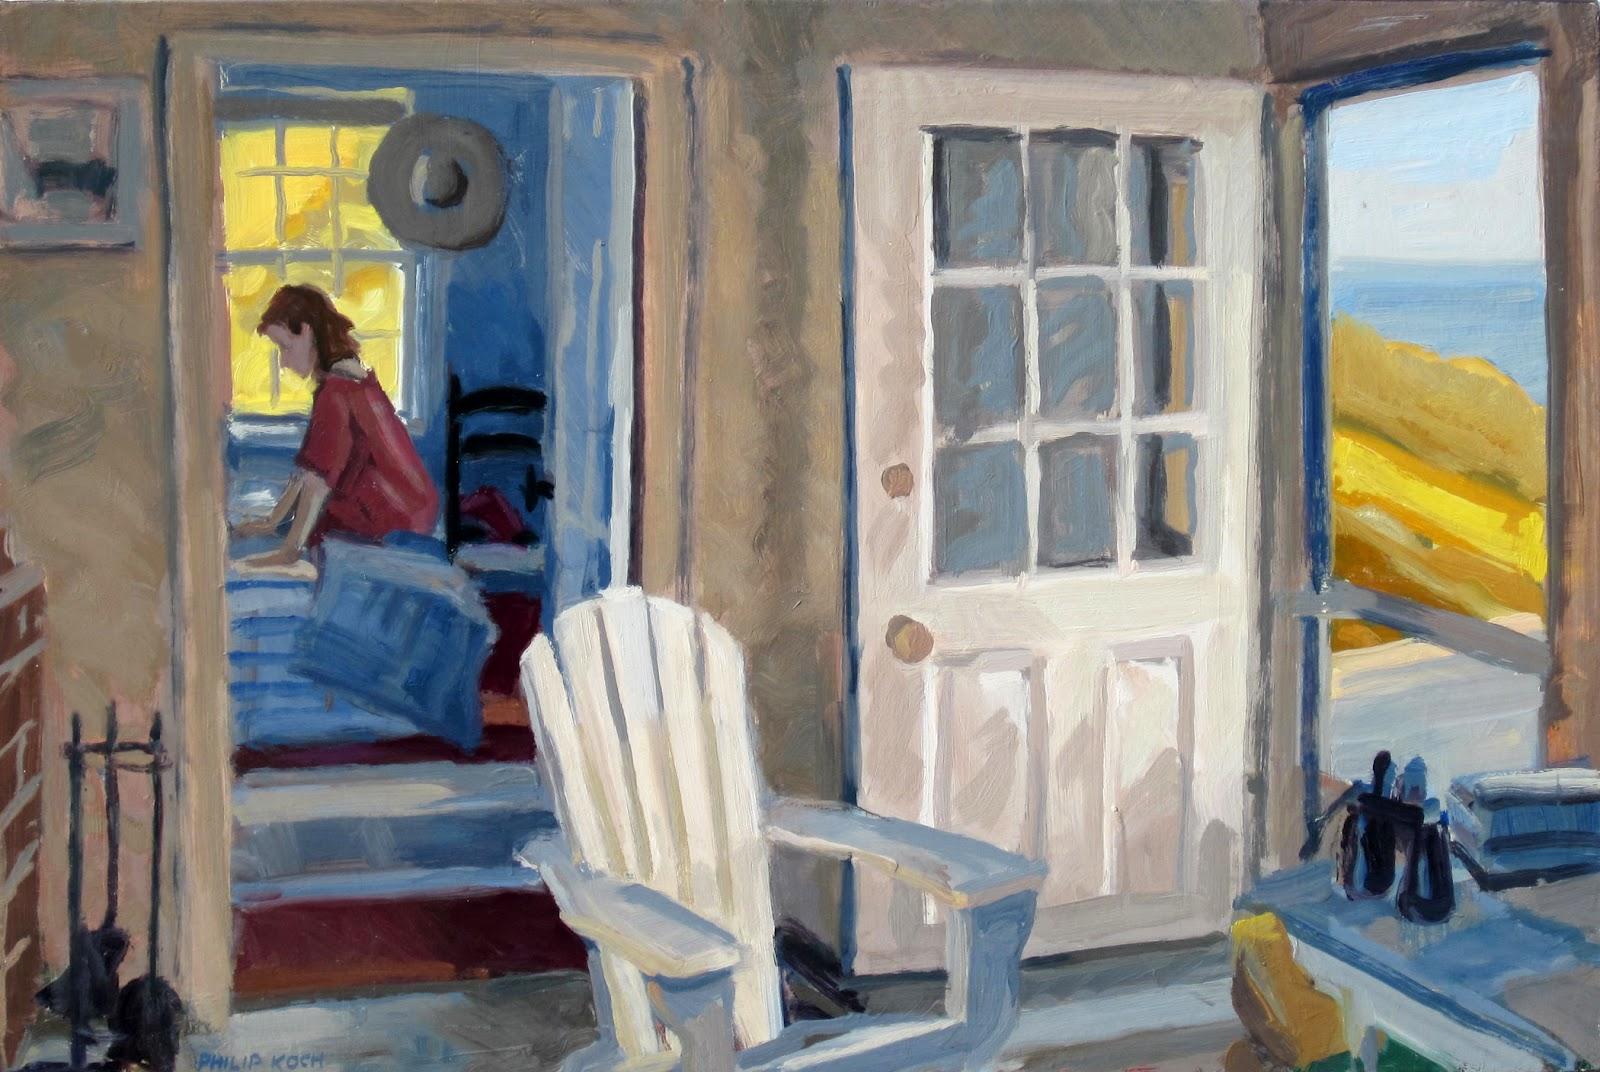 Edward Hopper House Art Center Exhibit in Nyack, NY